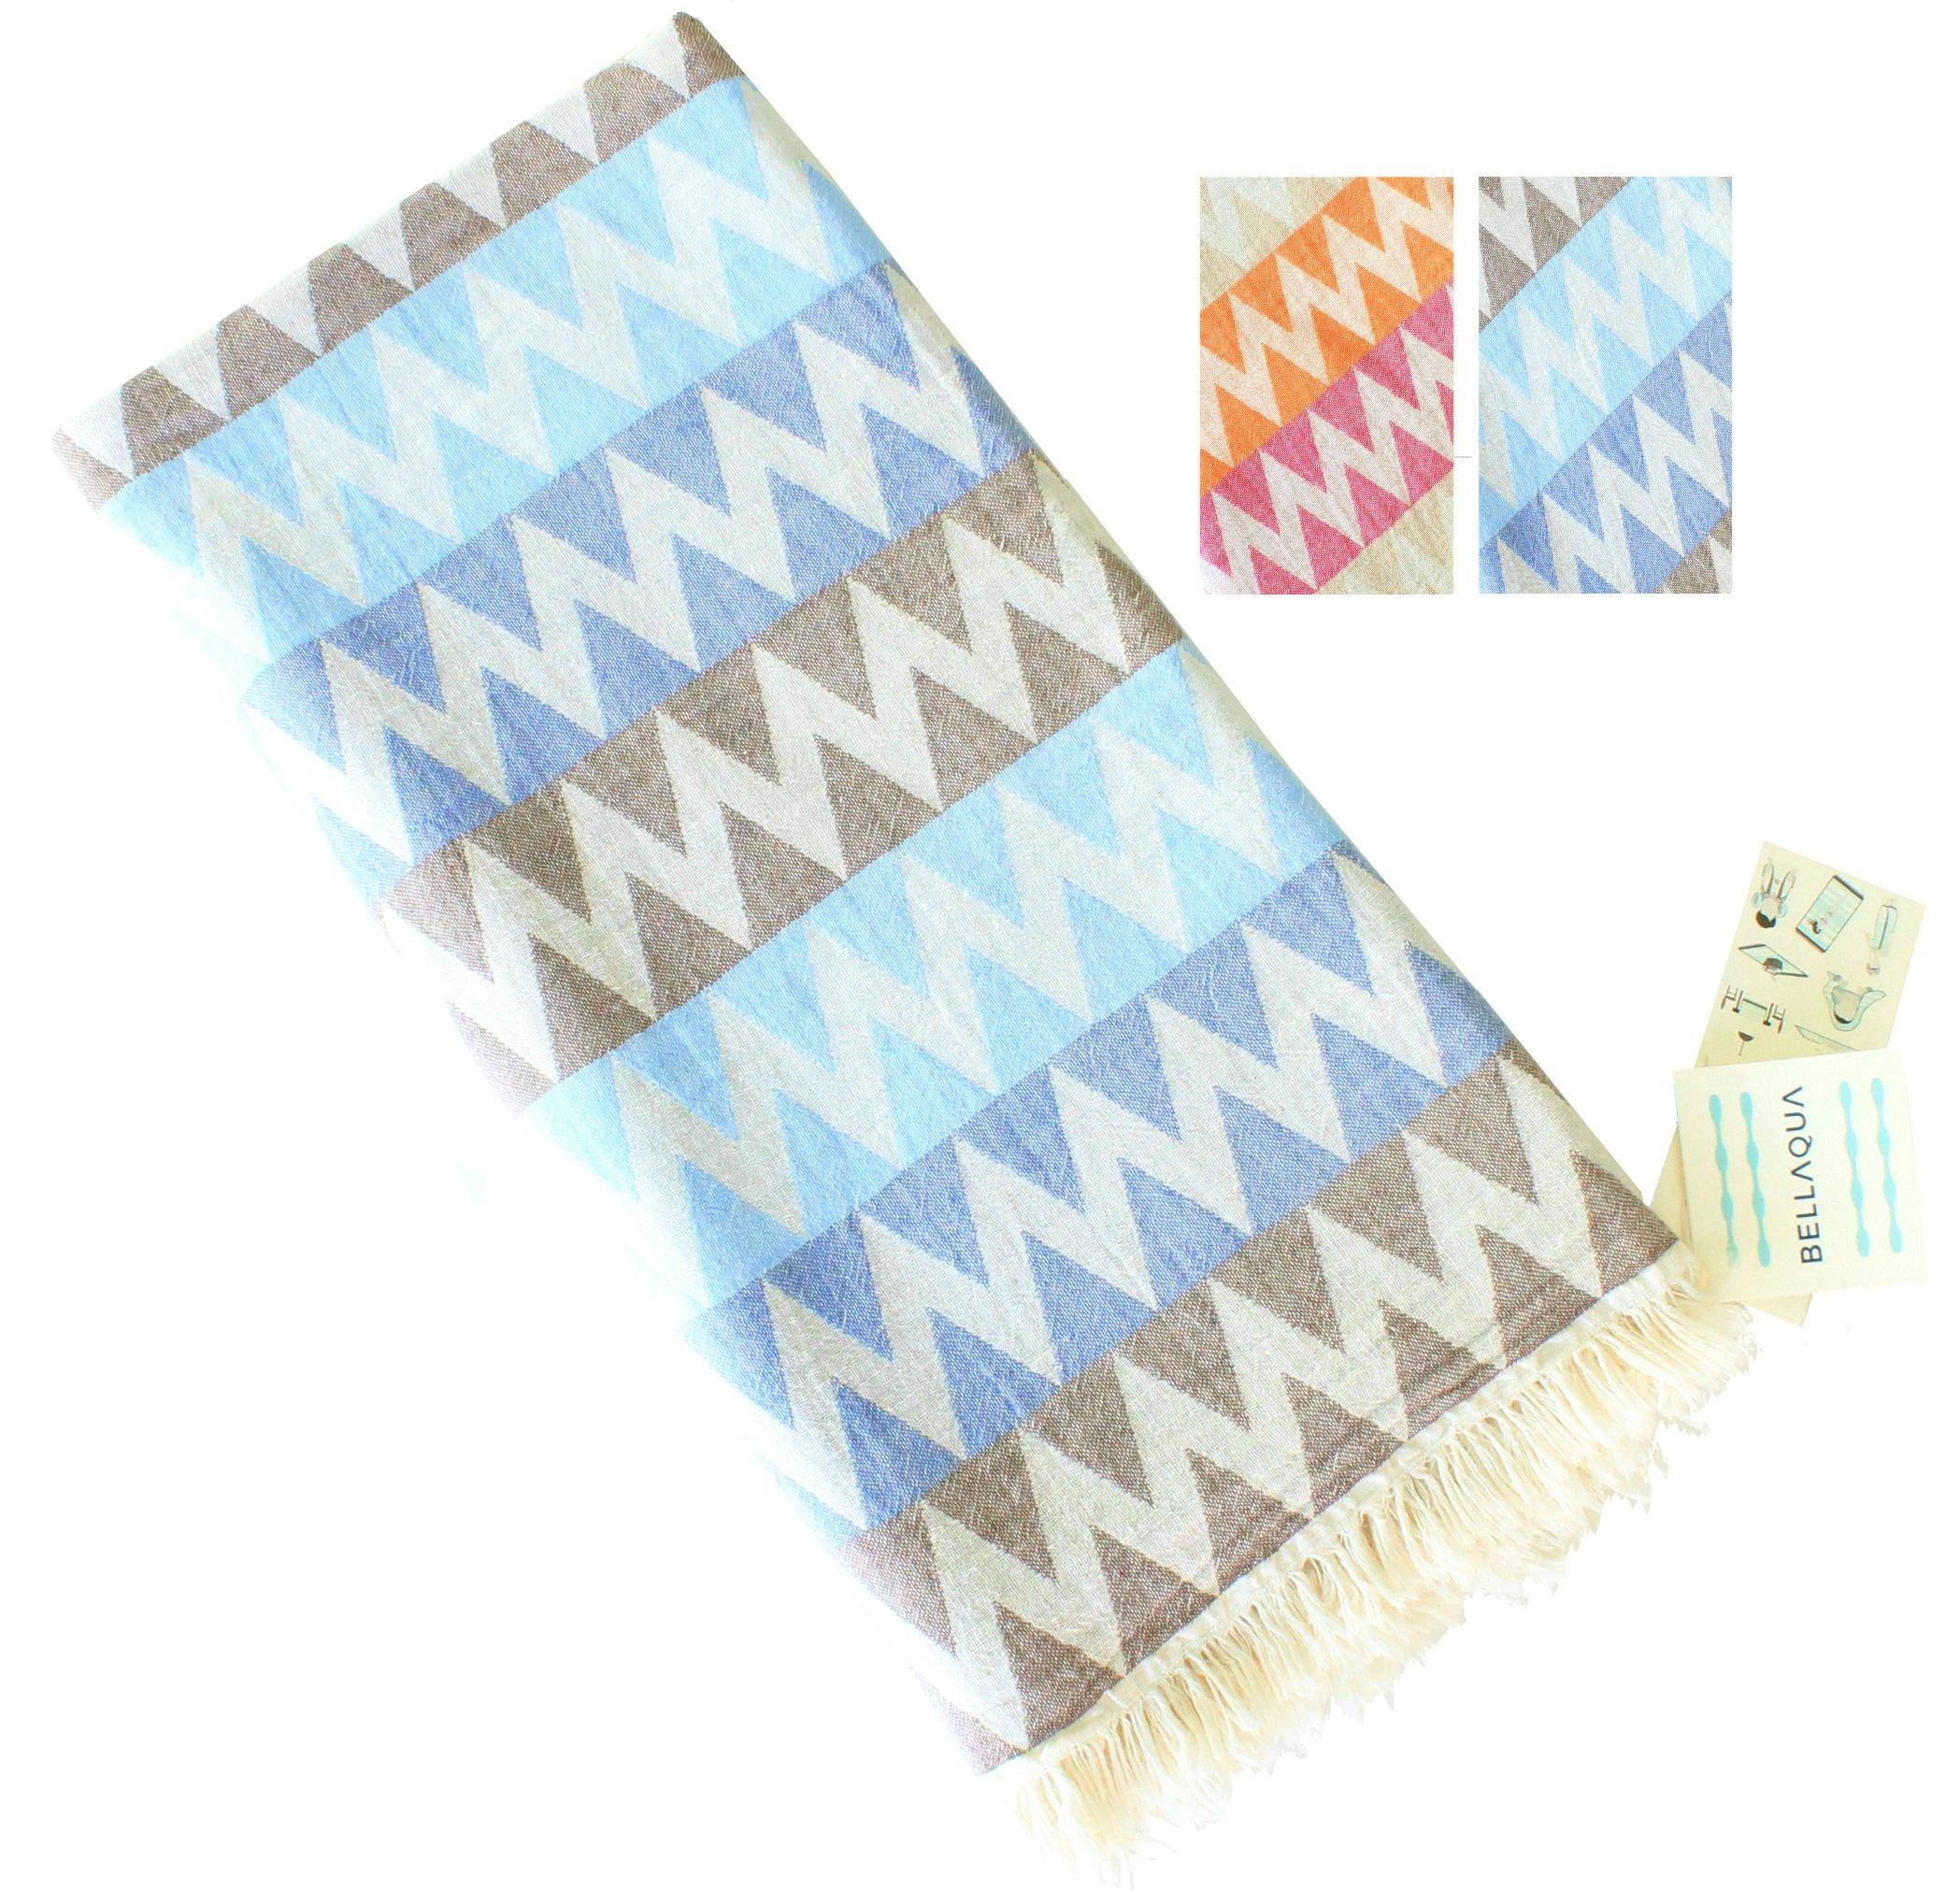 Bellaqua 100% Cotton Turkish Peshtemal Towel (1 pc) - Large 35 x 67 inches - Chevron Zigzag Jacquard - Beach Bath Spa Hammam Travel Camping - Lightweight Absorbent Compact Natural (Blue Navy Grey)